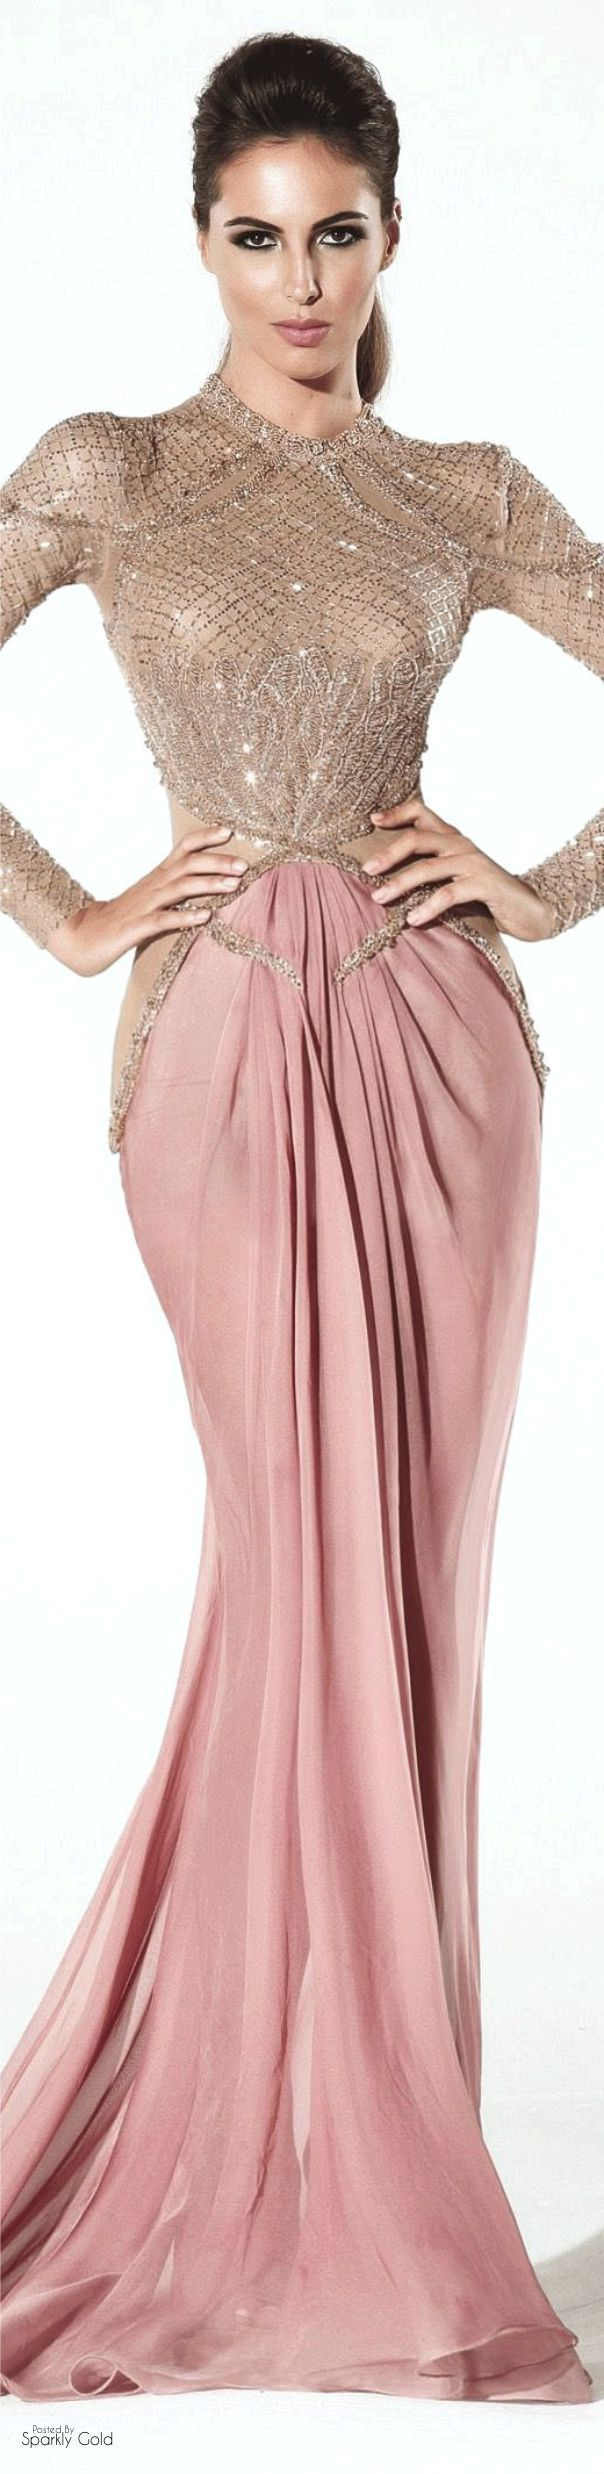 Mejores 51 imágenes de Formal Fashions - Modest Elegance en ...